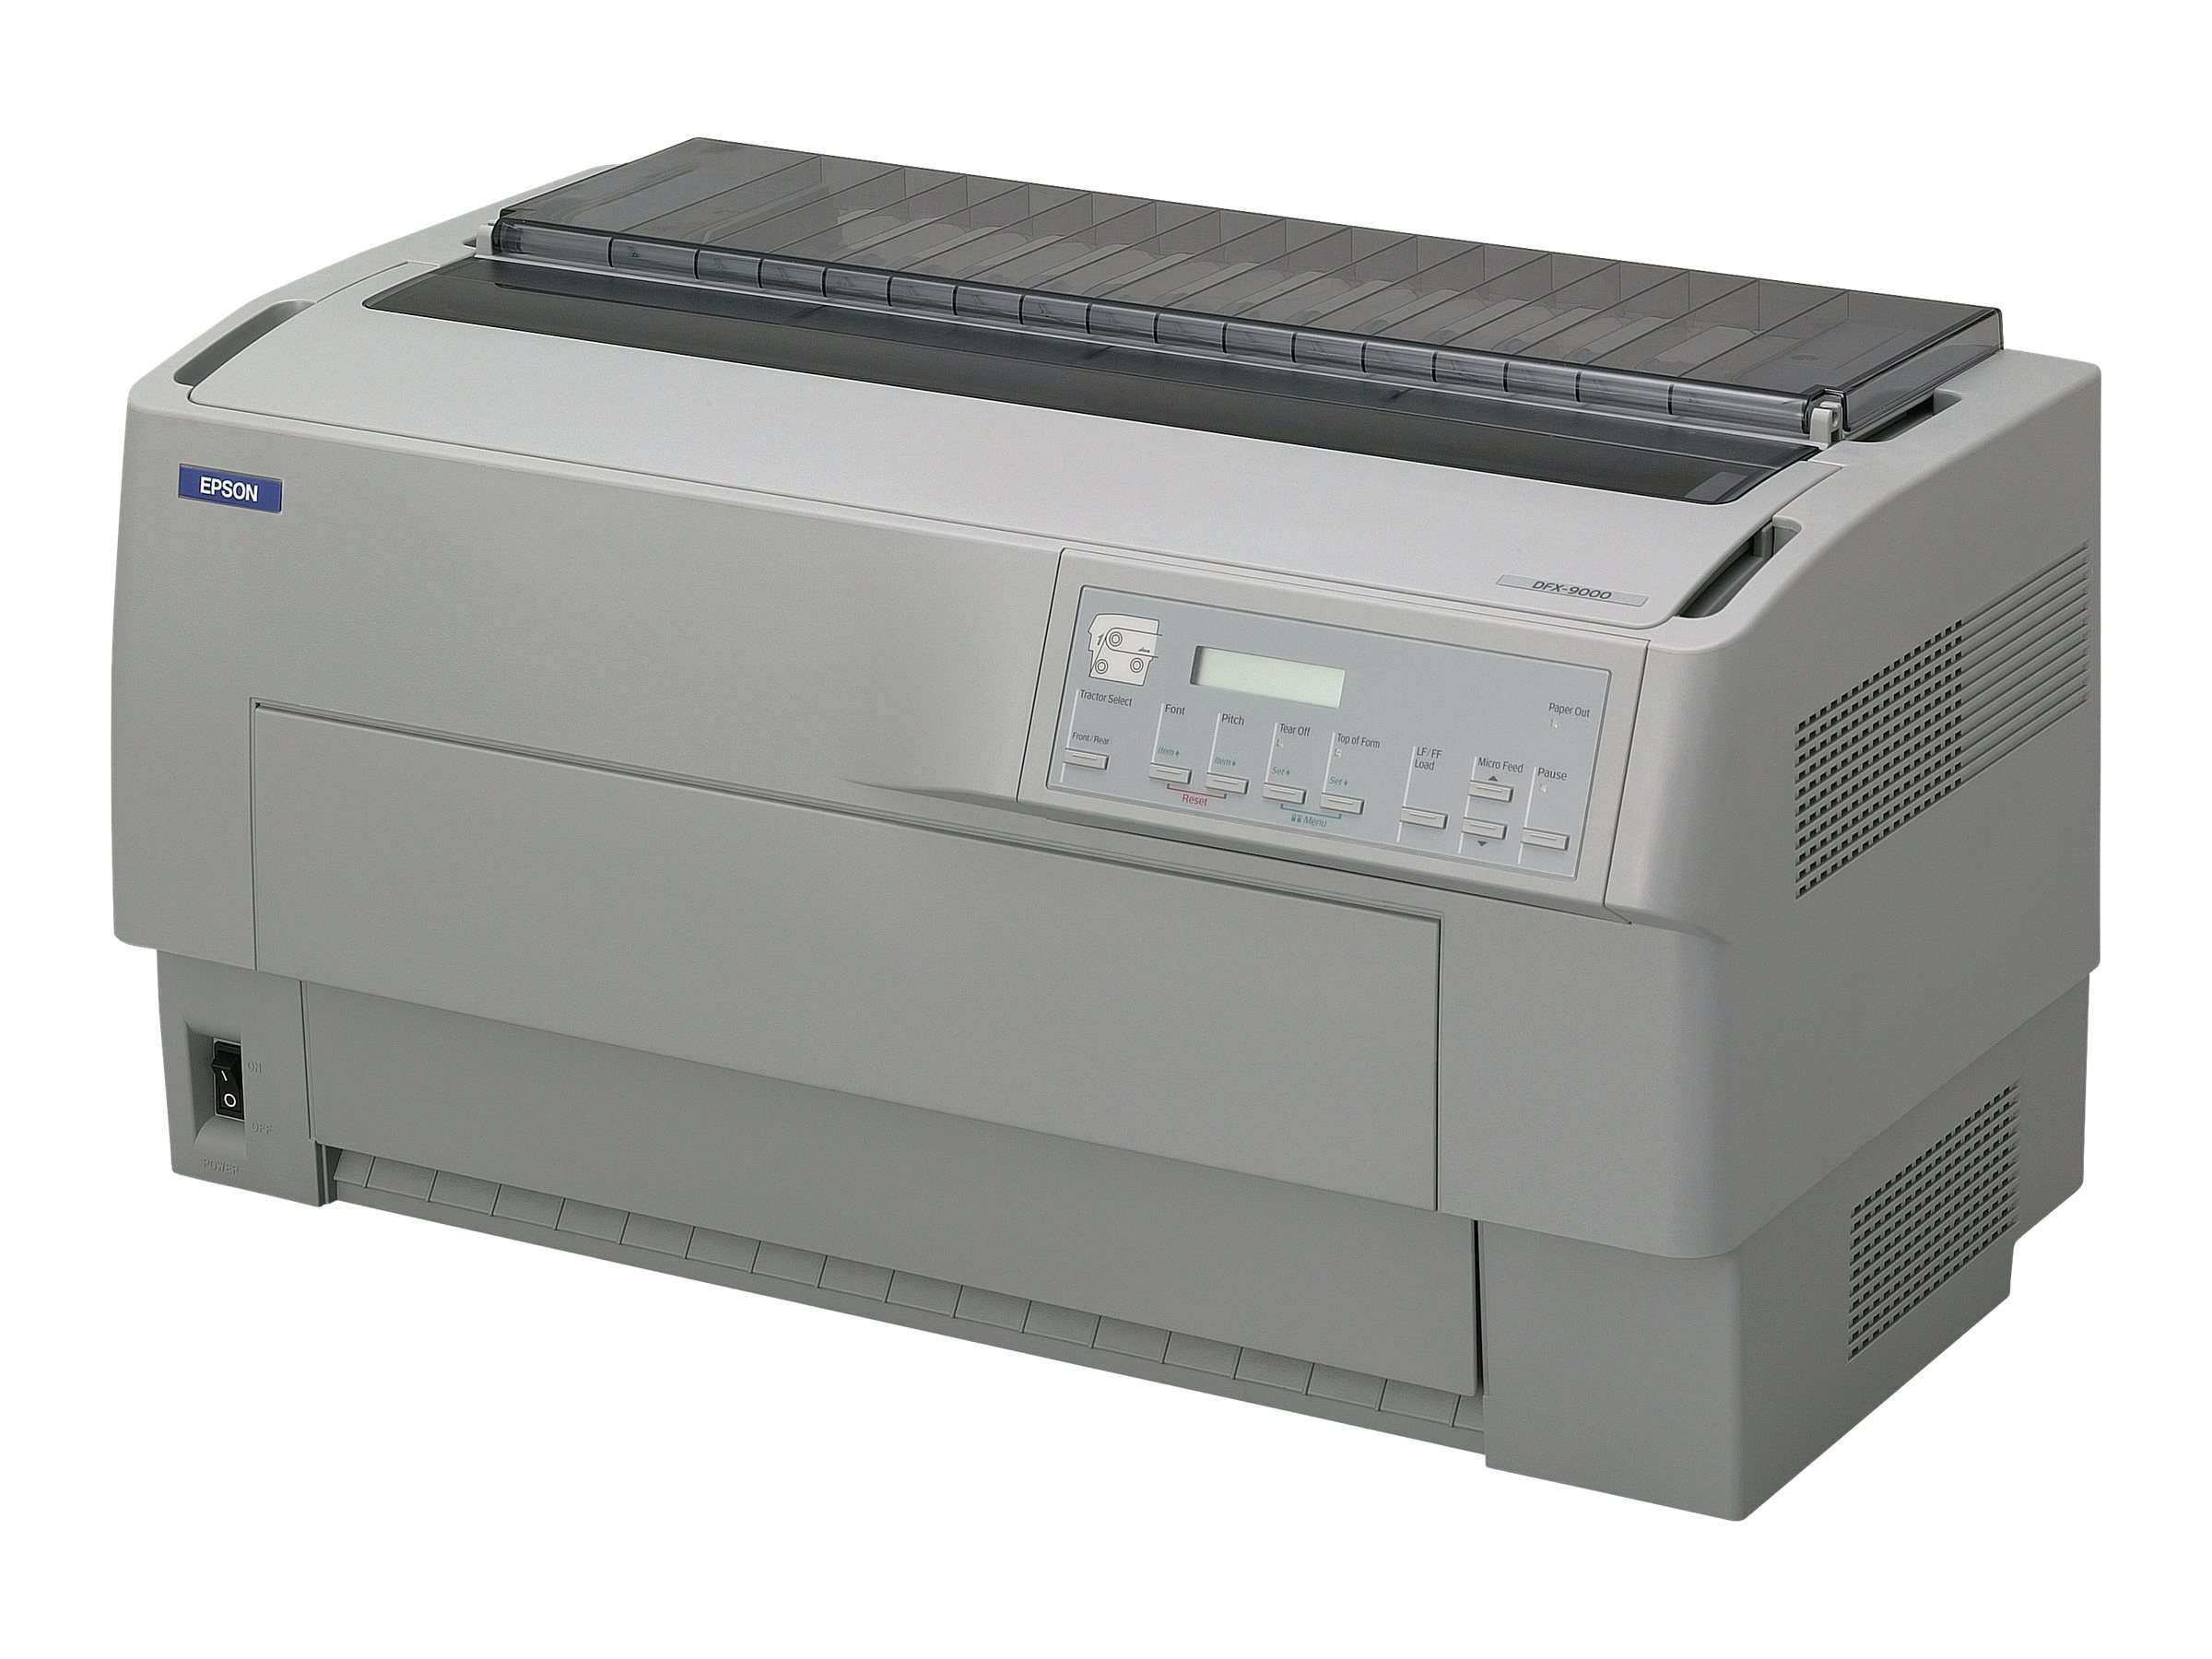 Epson DFX 9000N - Drucker - monochrom - Punktmatrix - 419,1 mm (Breite) - 240 x 144 dpi